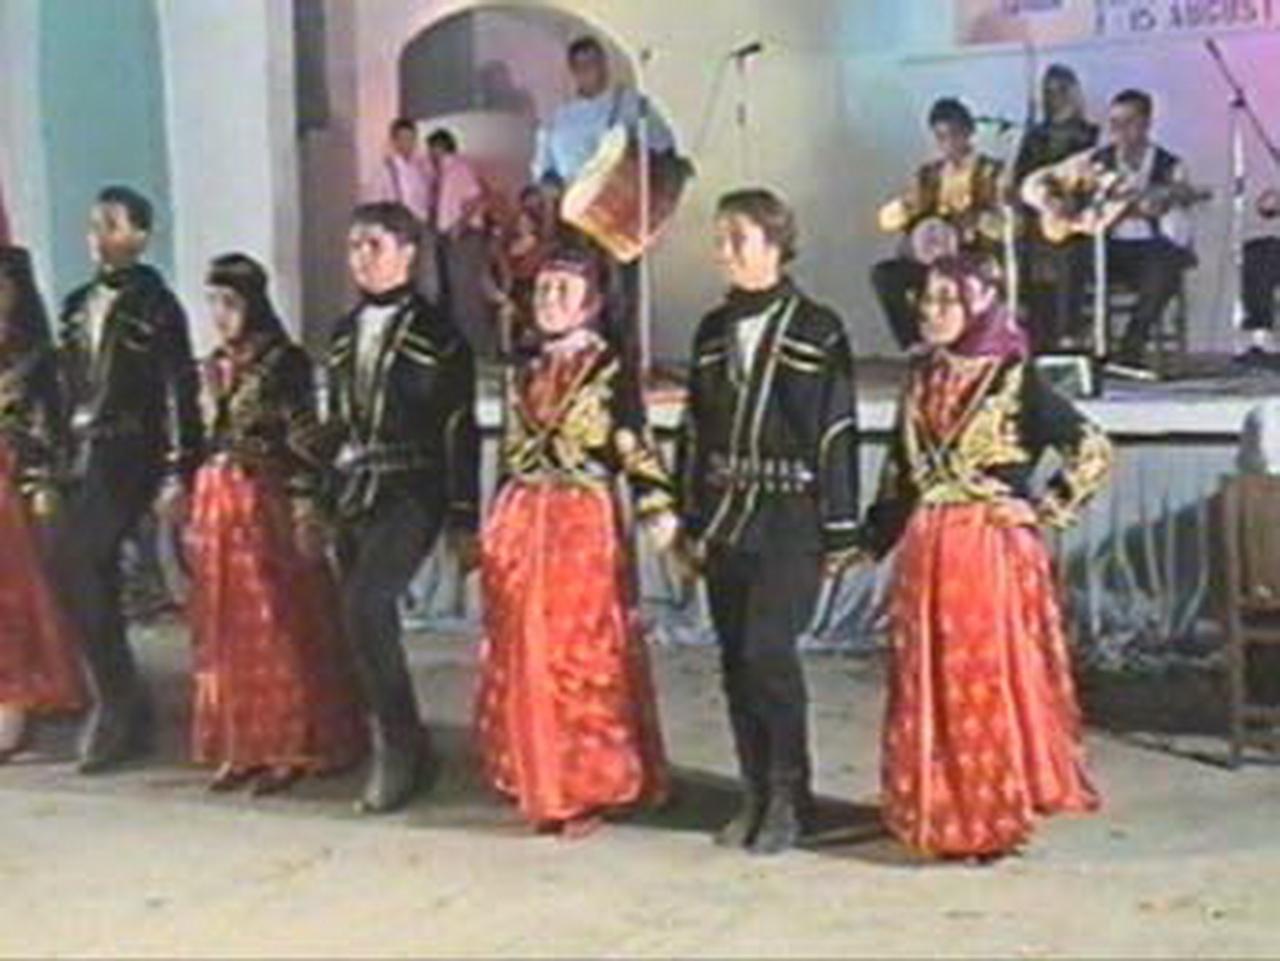 1998 - Ansamblul folcloric ''Halim Focali Anadolu Otelcilik ve Turizm Meslek Lisesi'' - Turcia